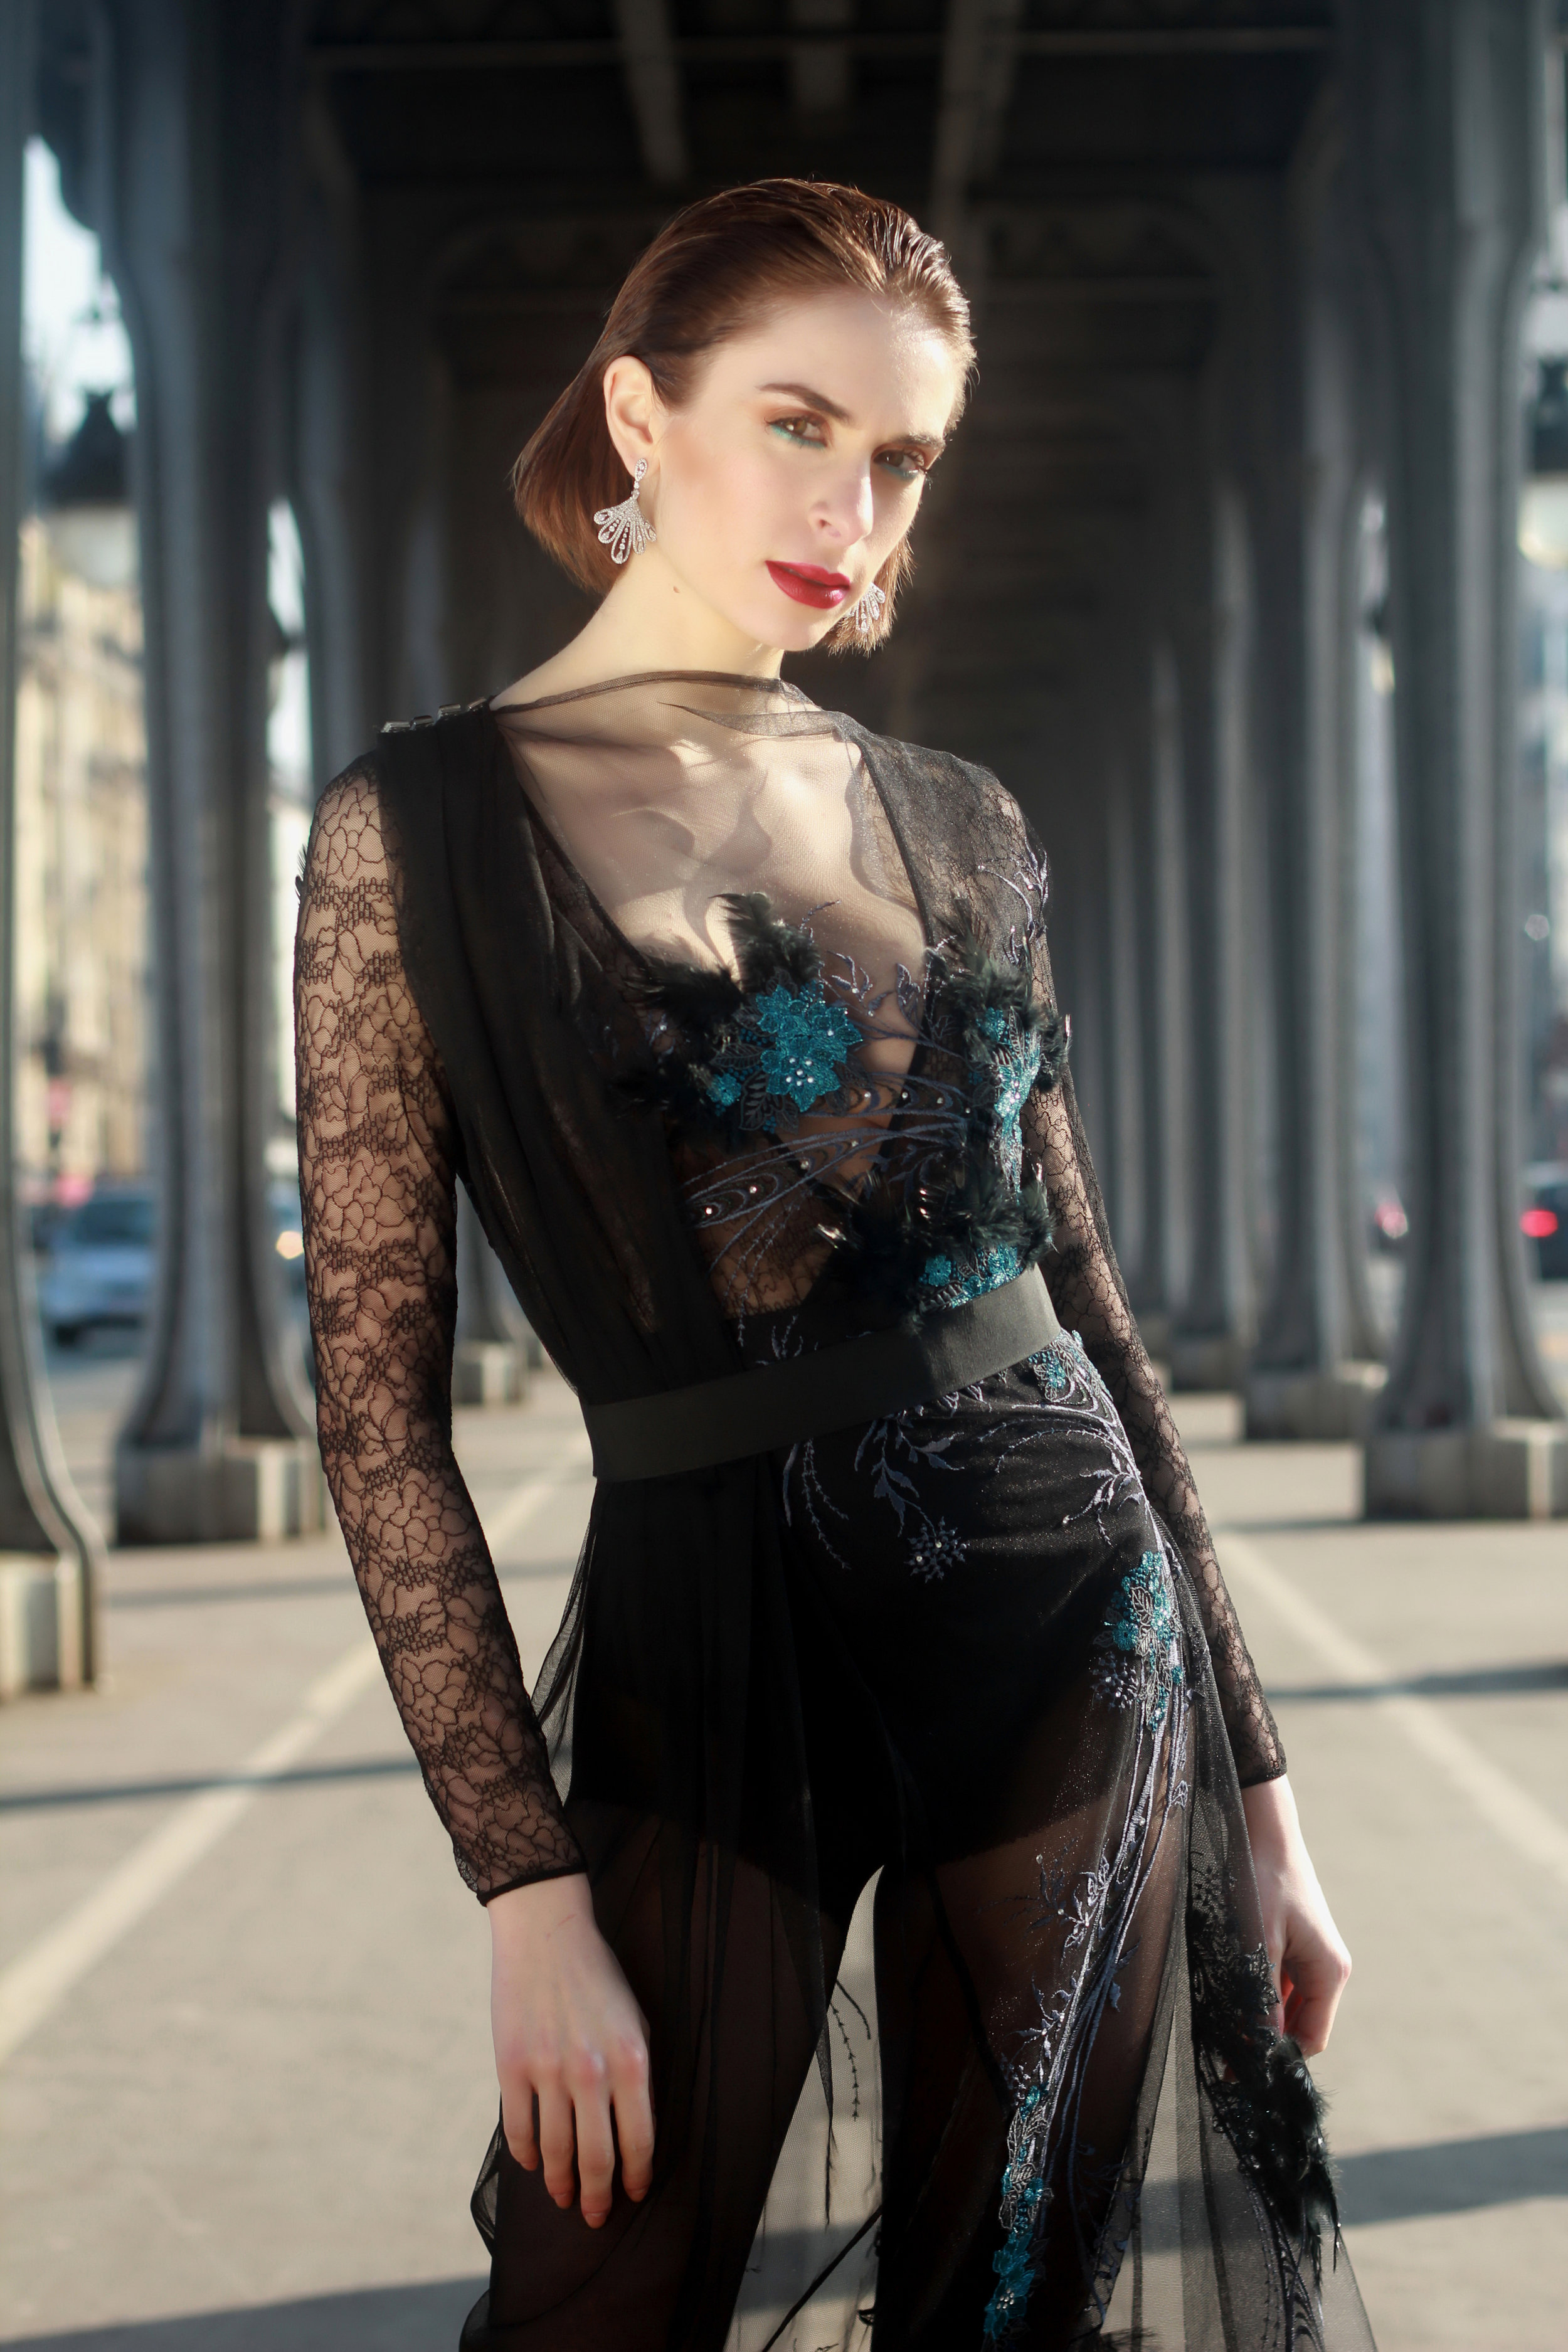 Dress : « The Pléonasme », Moira Cristescu  Earrings : Tophills (LAB created Diamond Jewelry)  Panty : Agent Provocateur